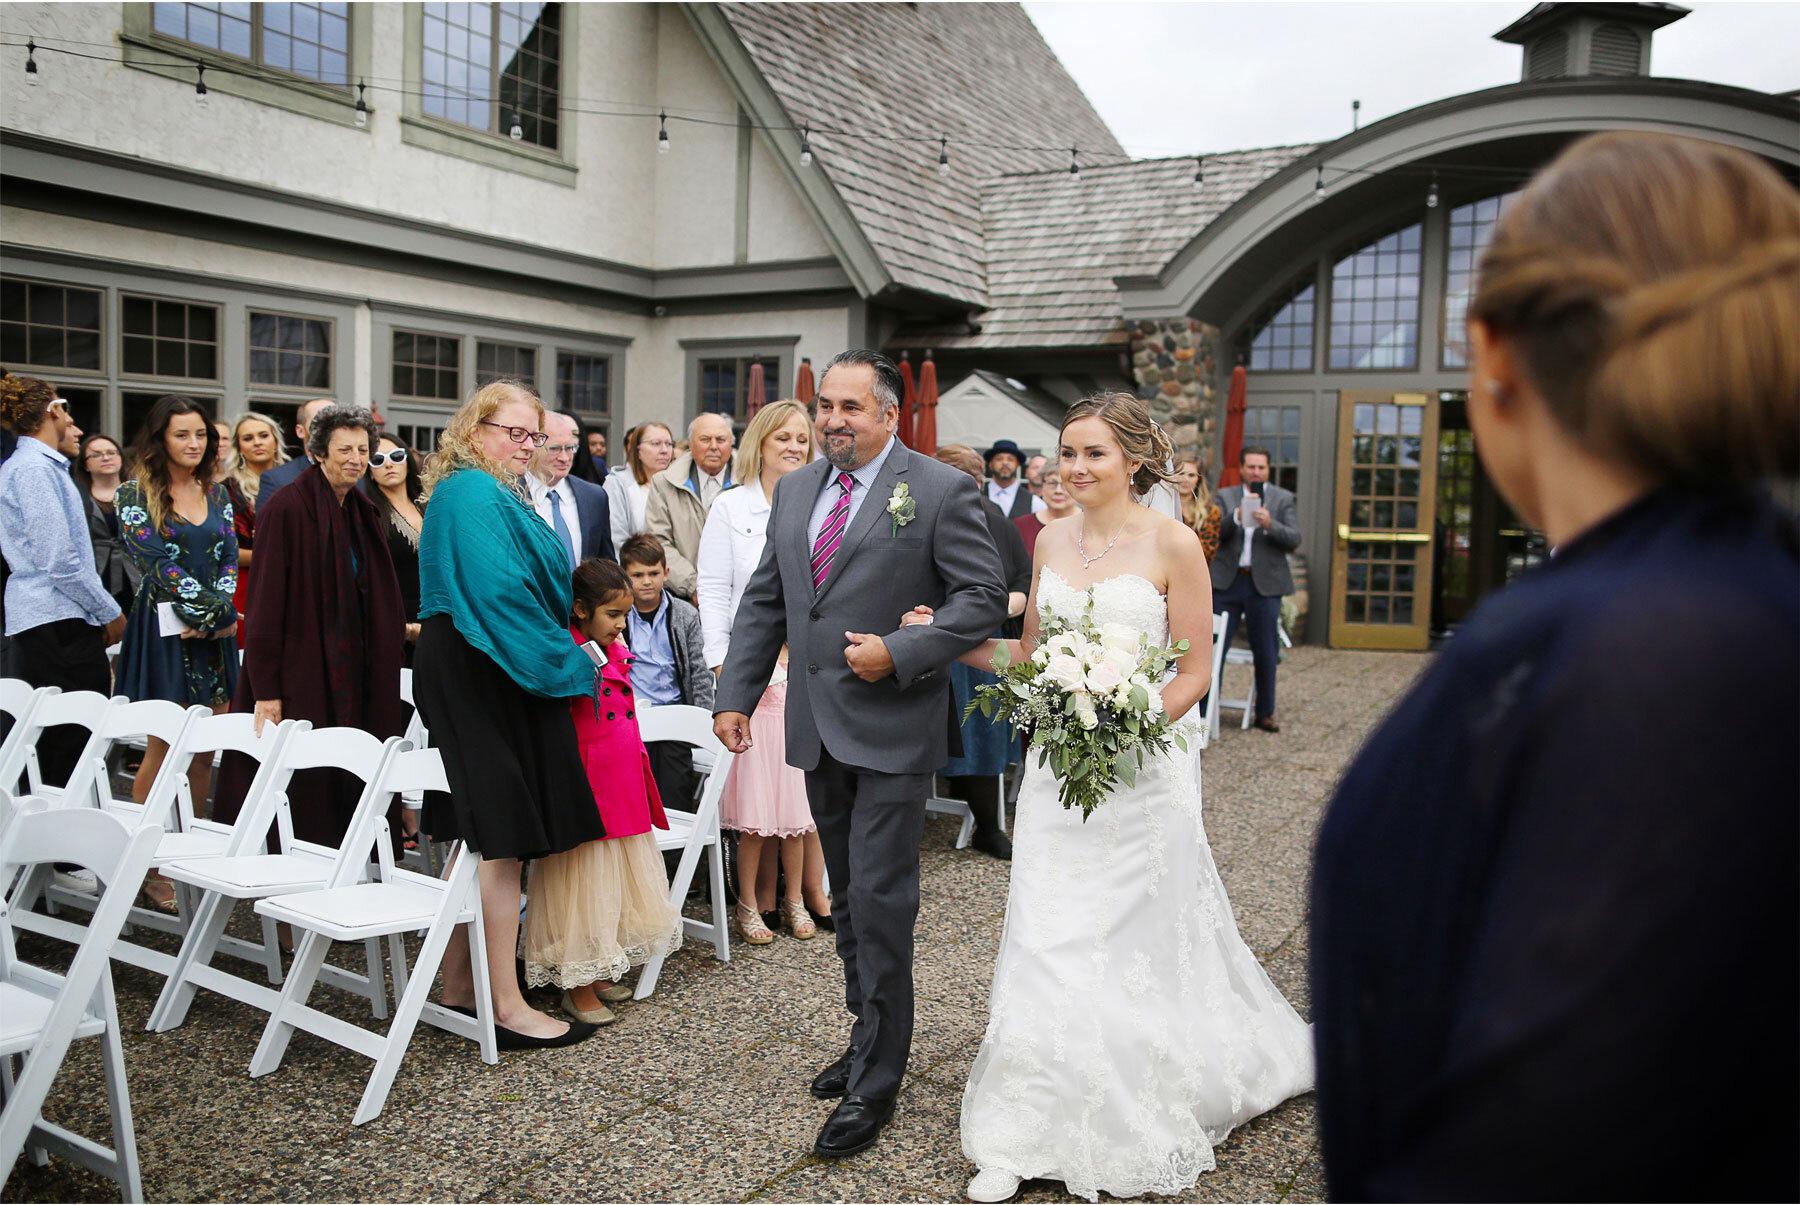 09-Vick-Photography-Minneapolis-Minnesota-Wedding-Rush-Creek-Golf-Club-Ceremony-Outdoor-Bride-Father-Amanda-and-Michael.jpg